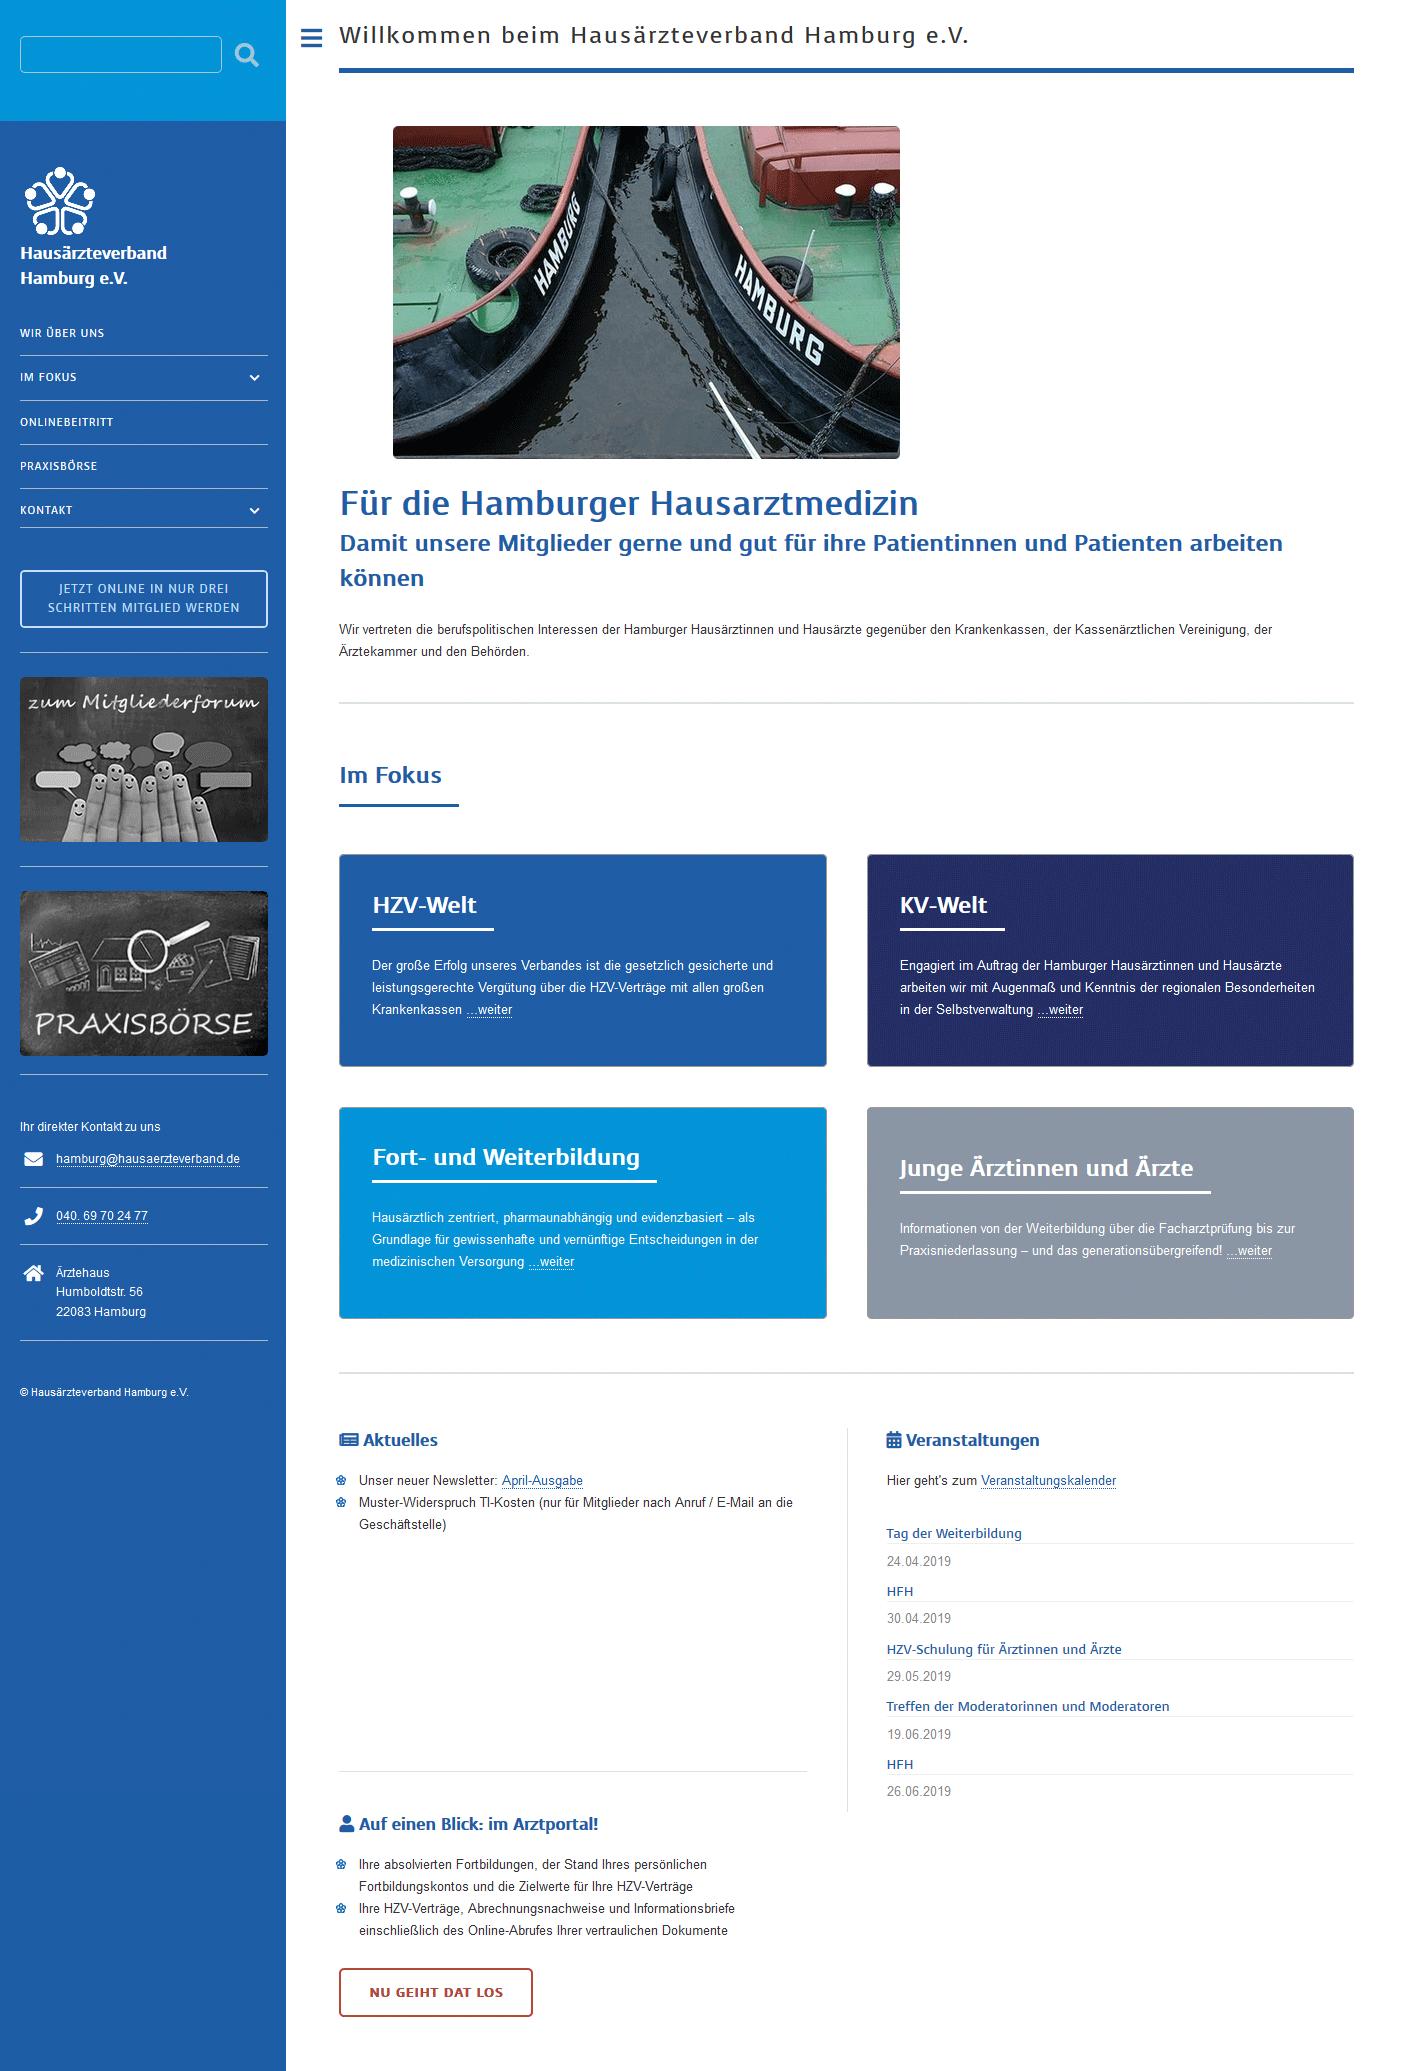 Responsive Website mit TYPO3 - Hausärzteverand Hamburg